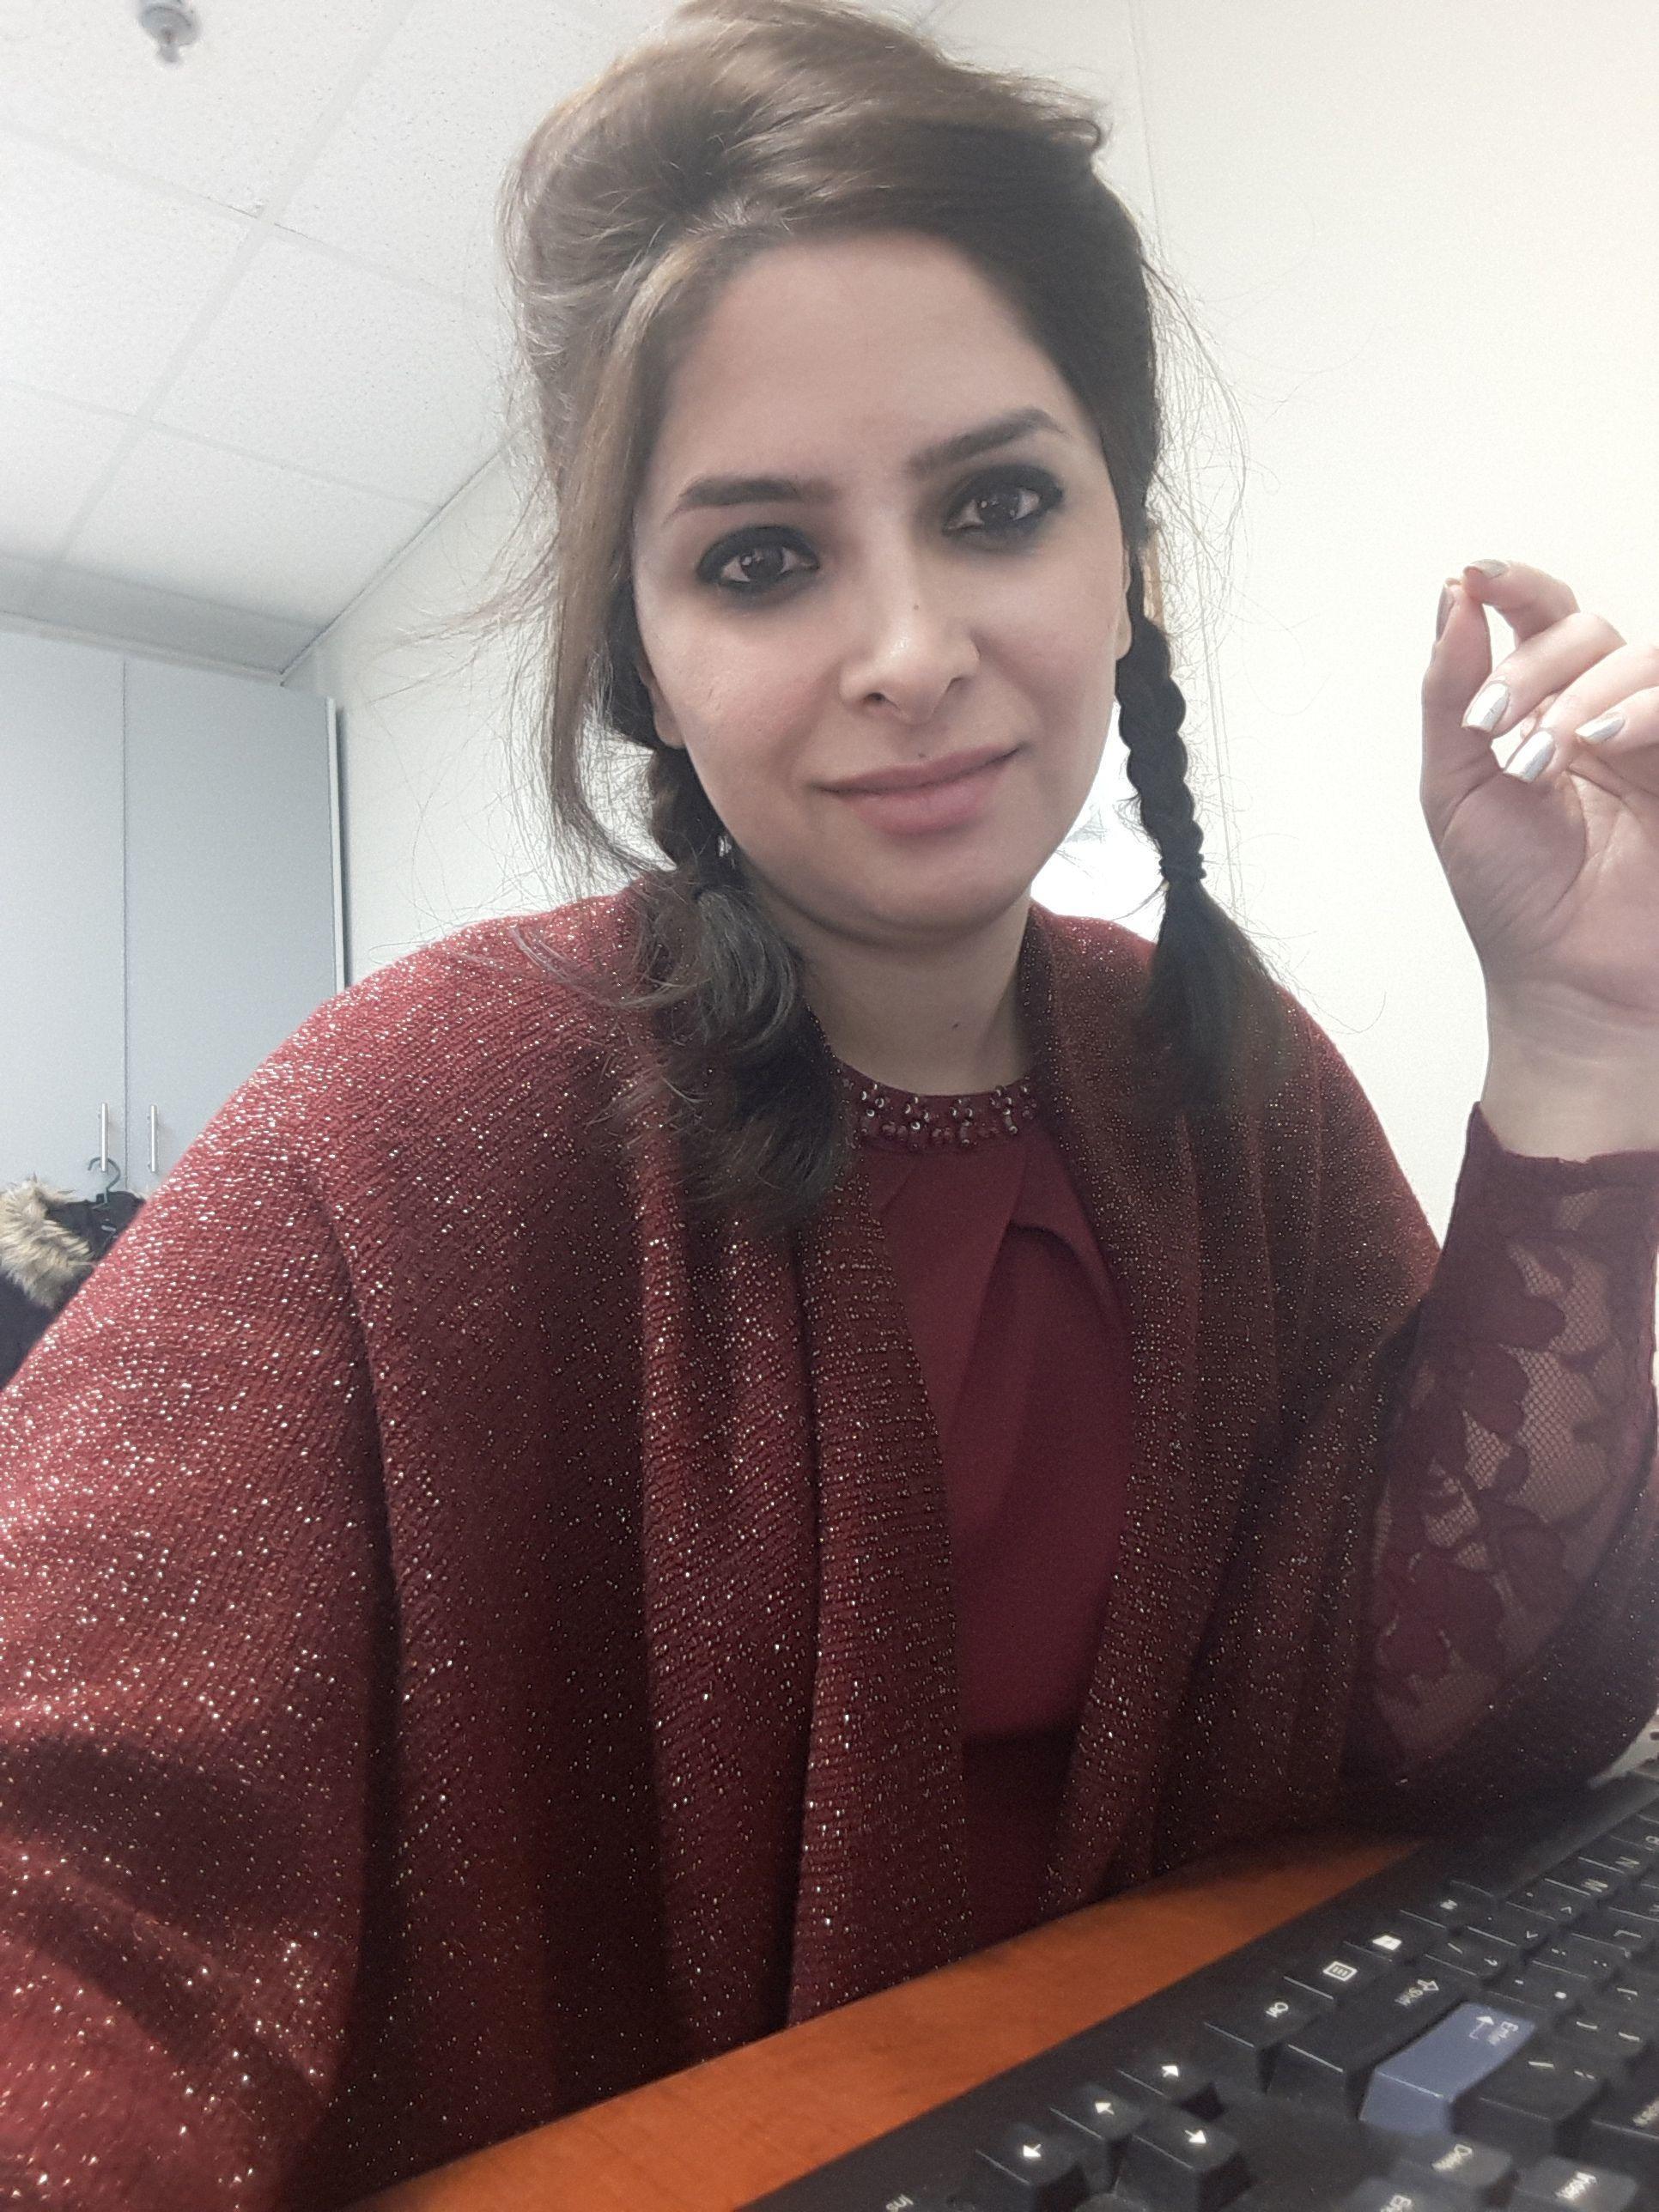 Christian hookup muslims girls beautiful pics